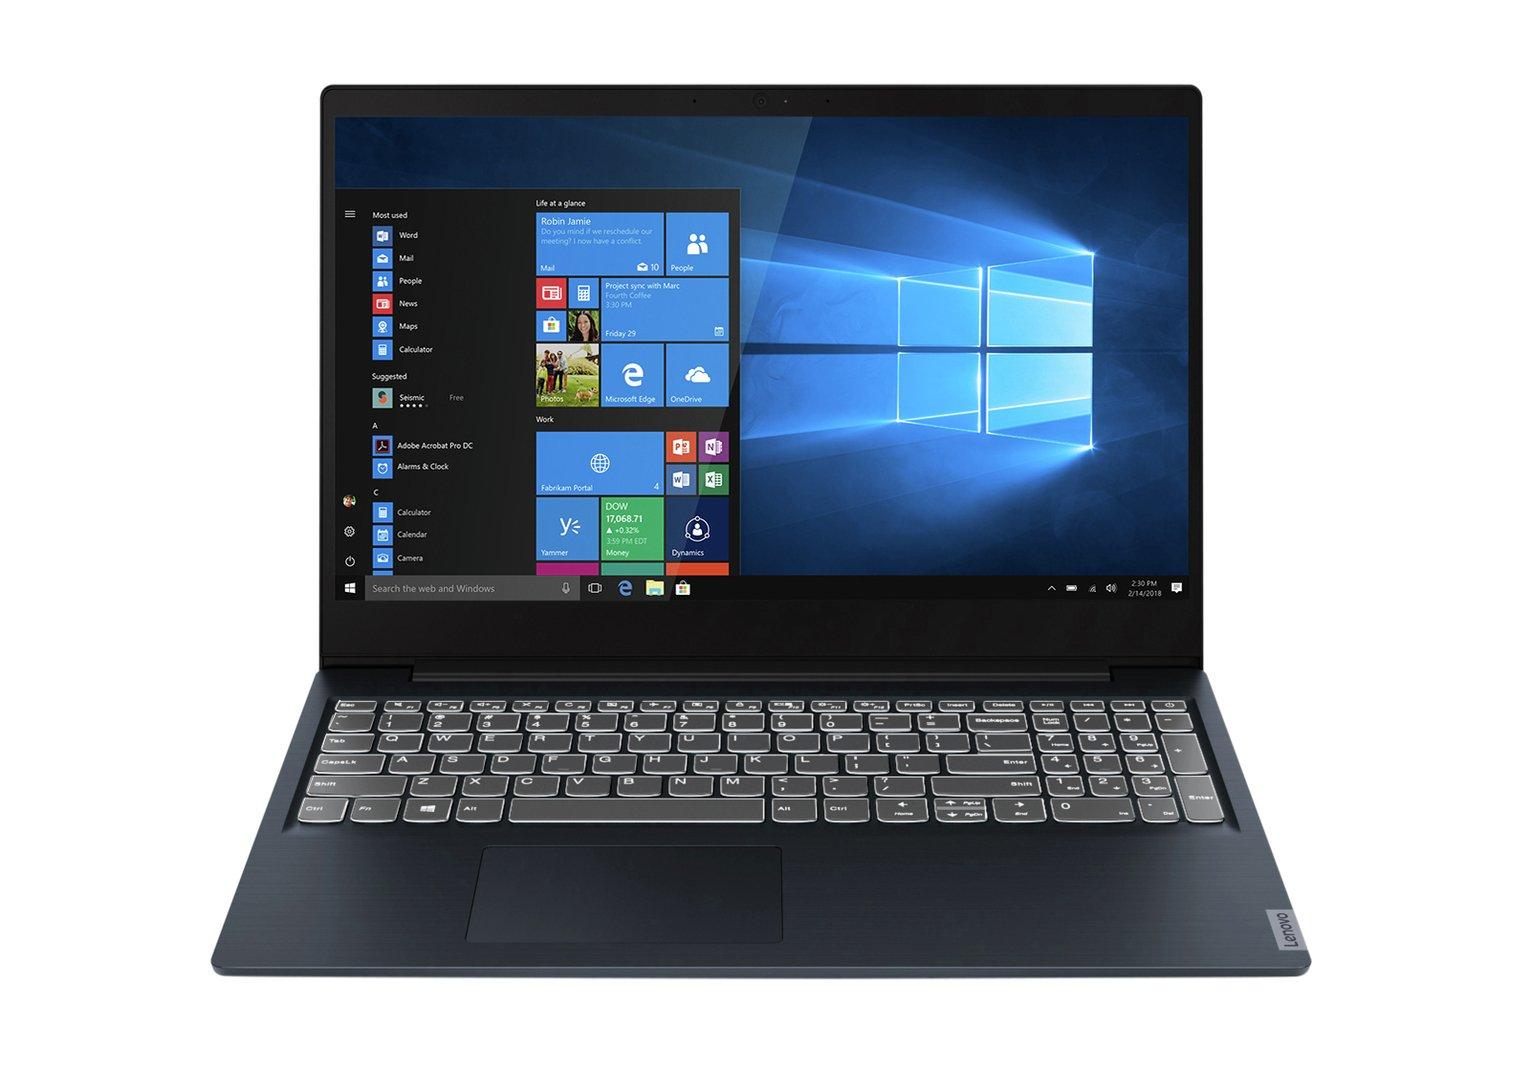 Lenovo IdeaPad S340 15.6 Inch Ryzen 7 8GB 512GB FHD Laptop